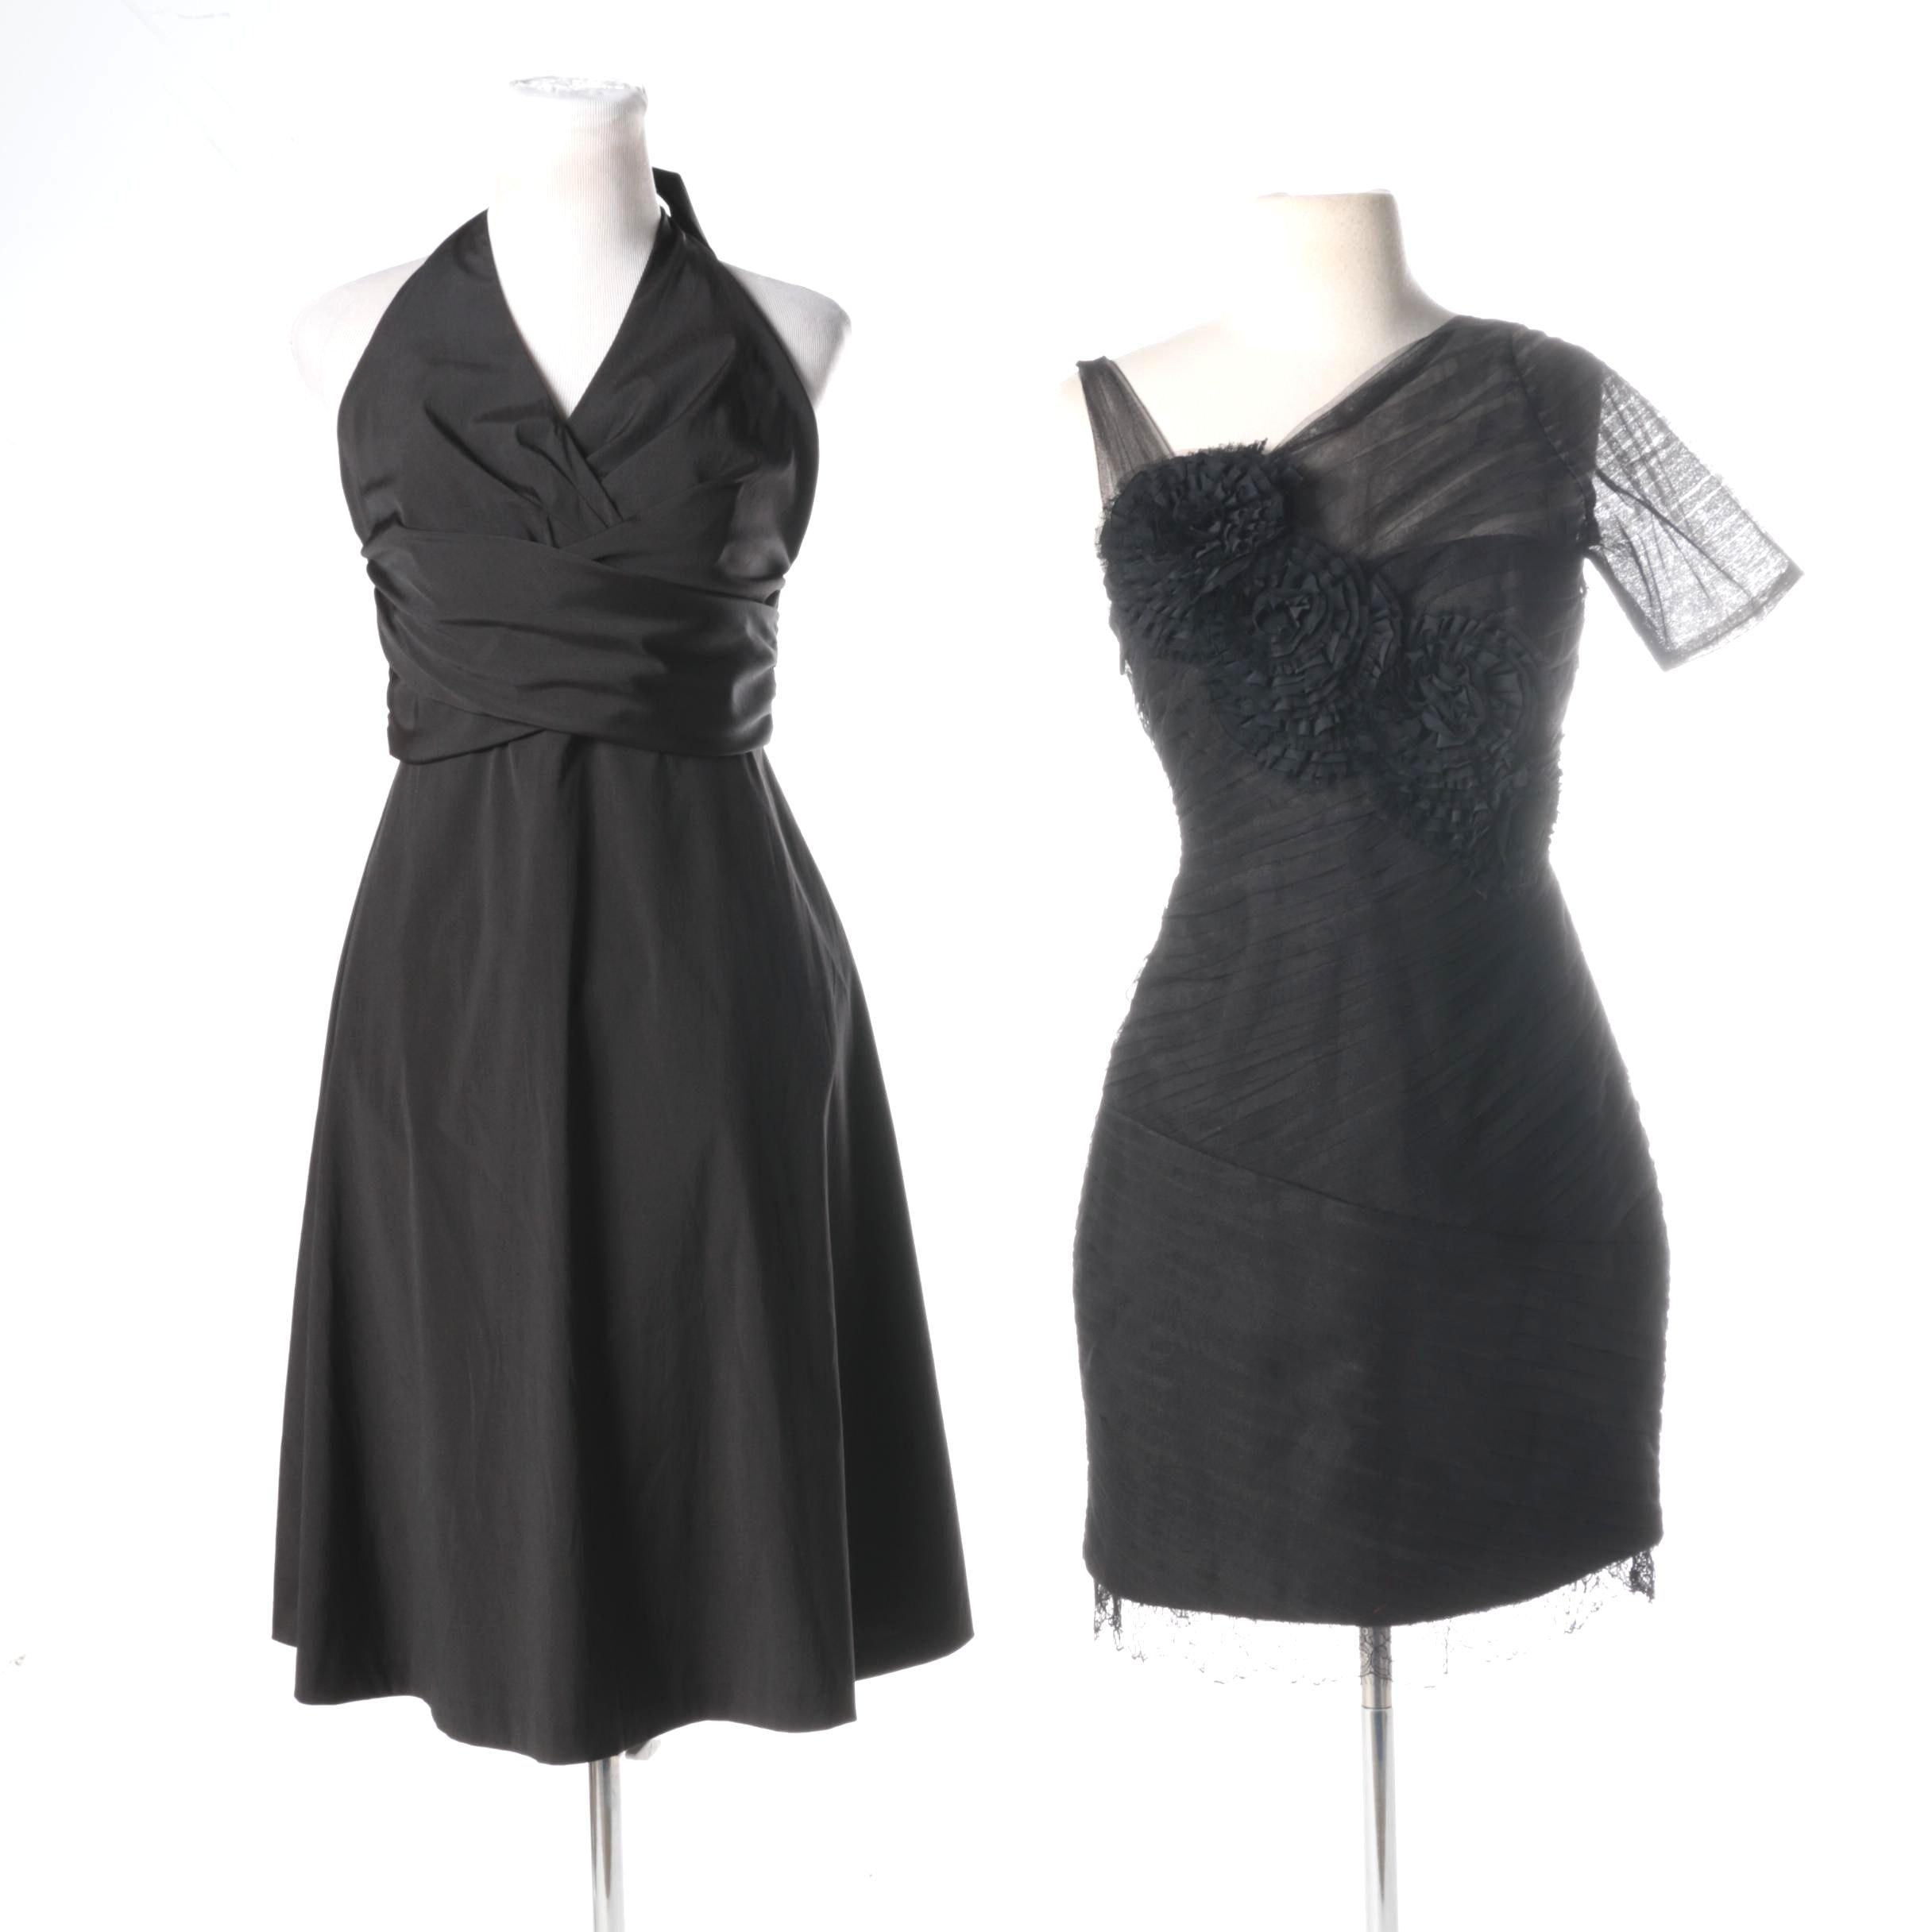 Black and white market cocktail dresses